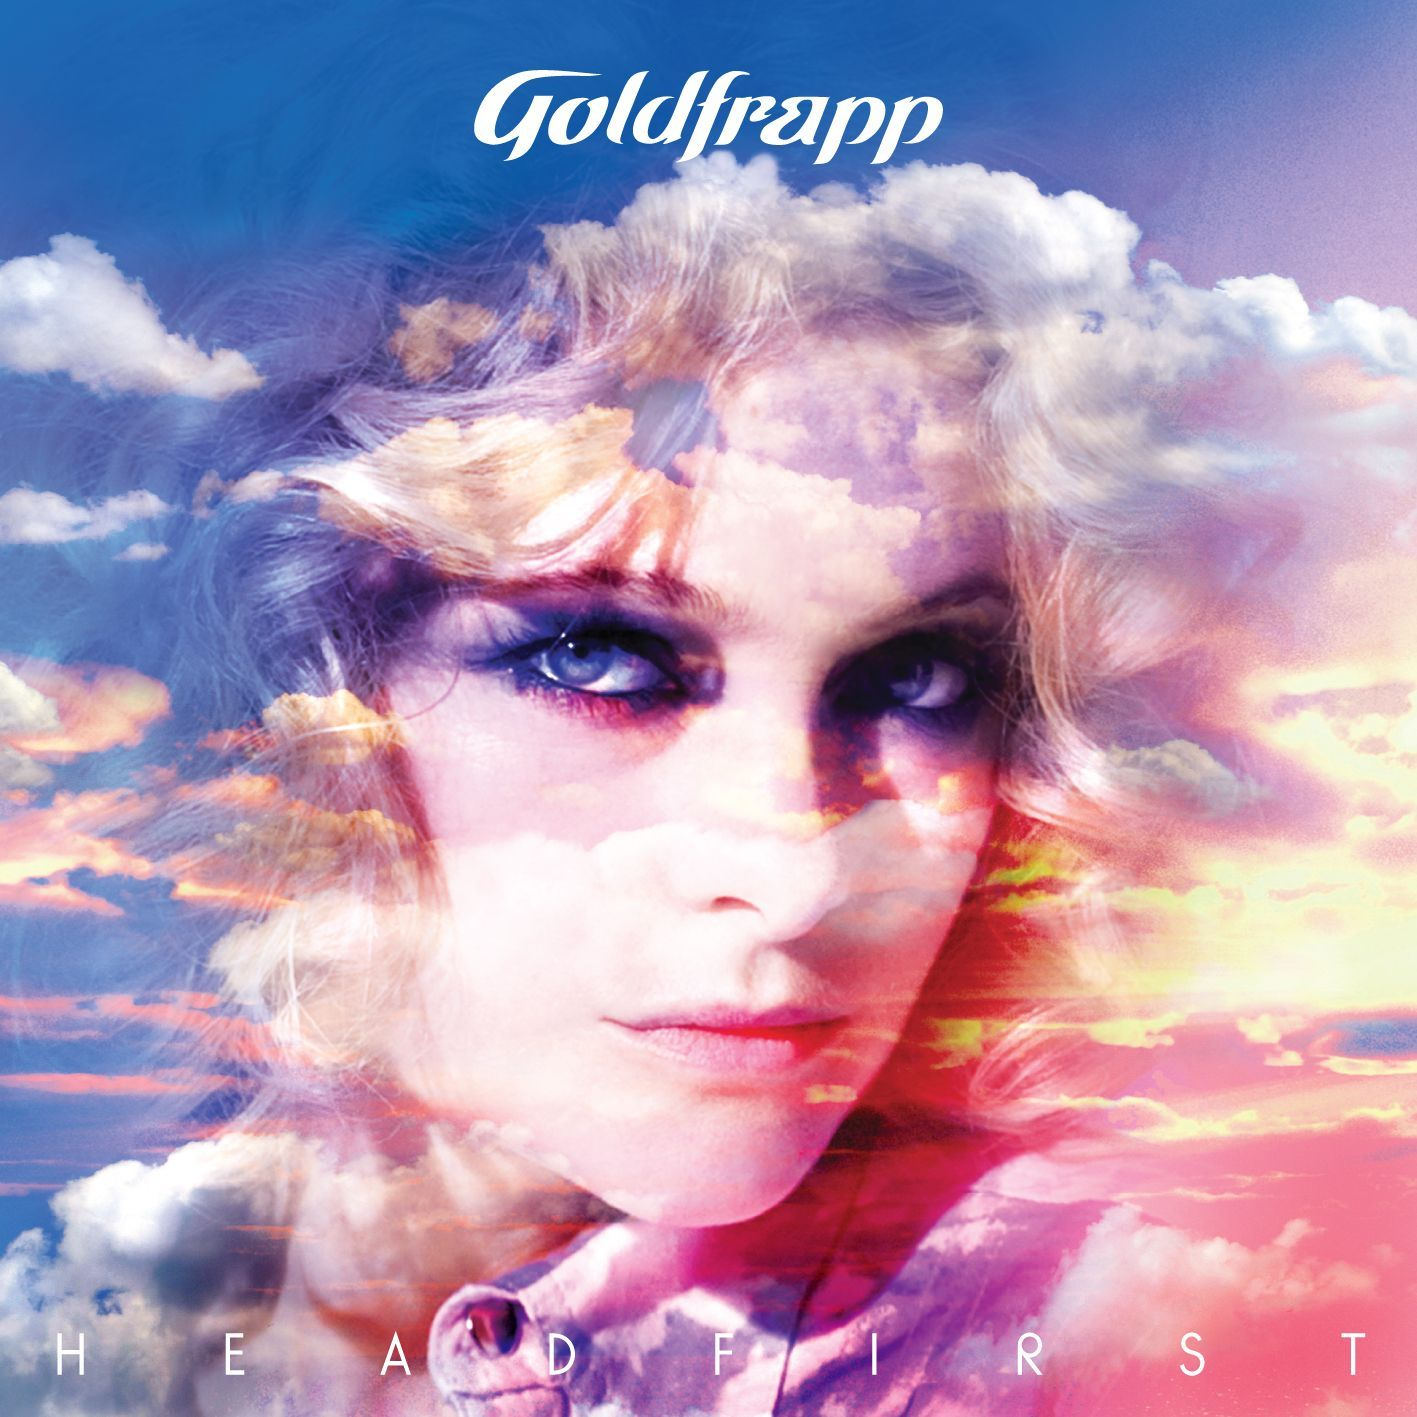 Goldfrapp - Head First album cover